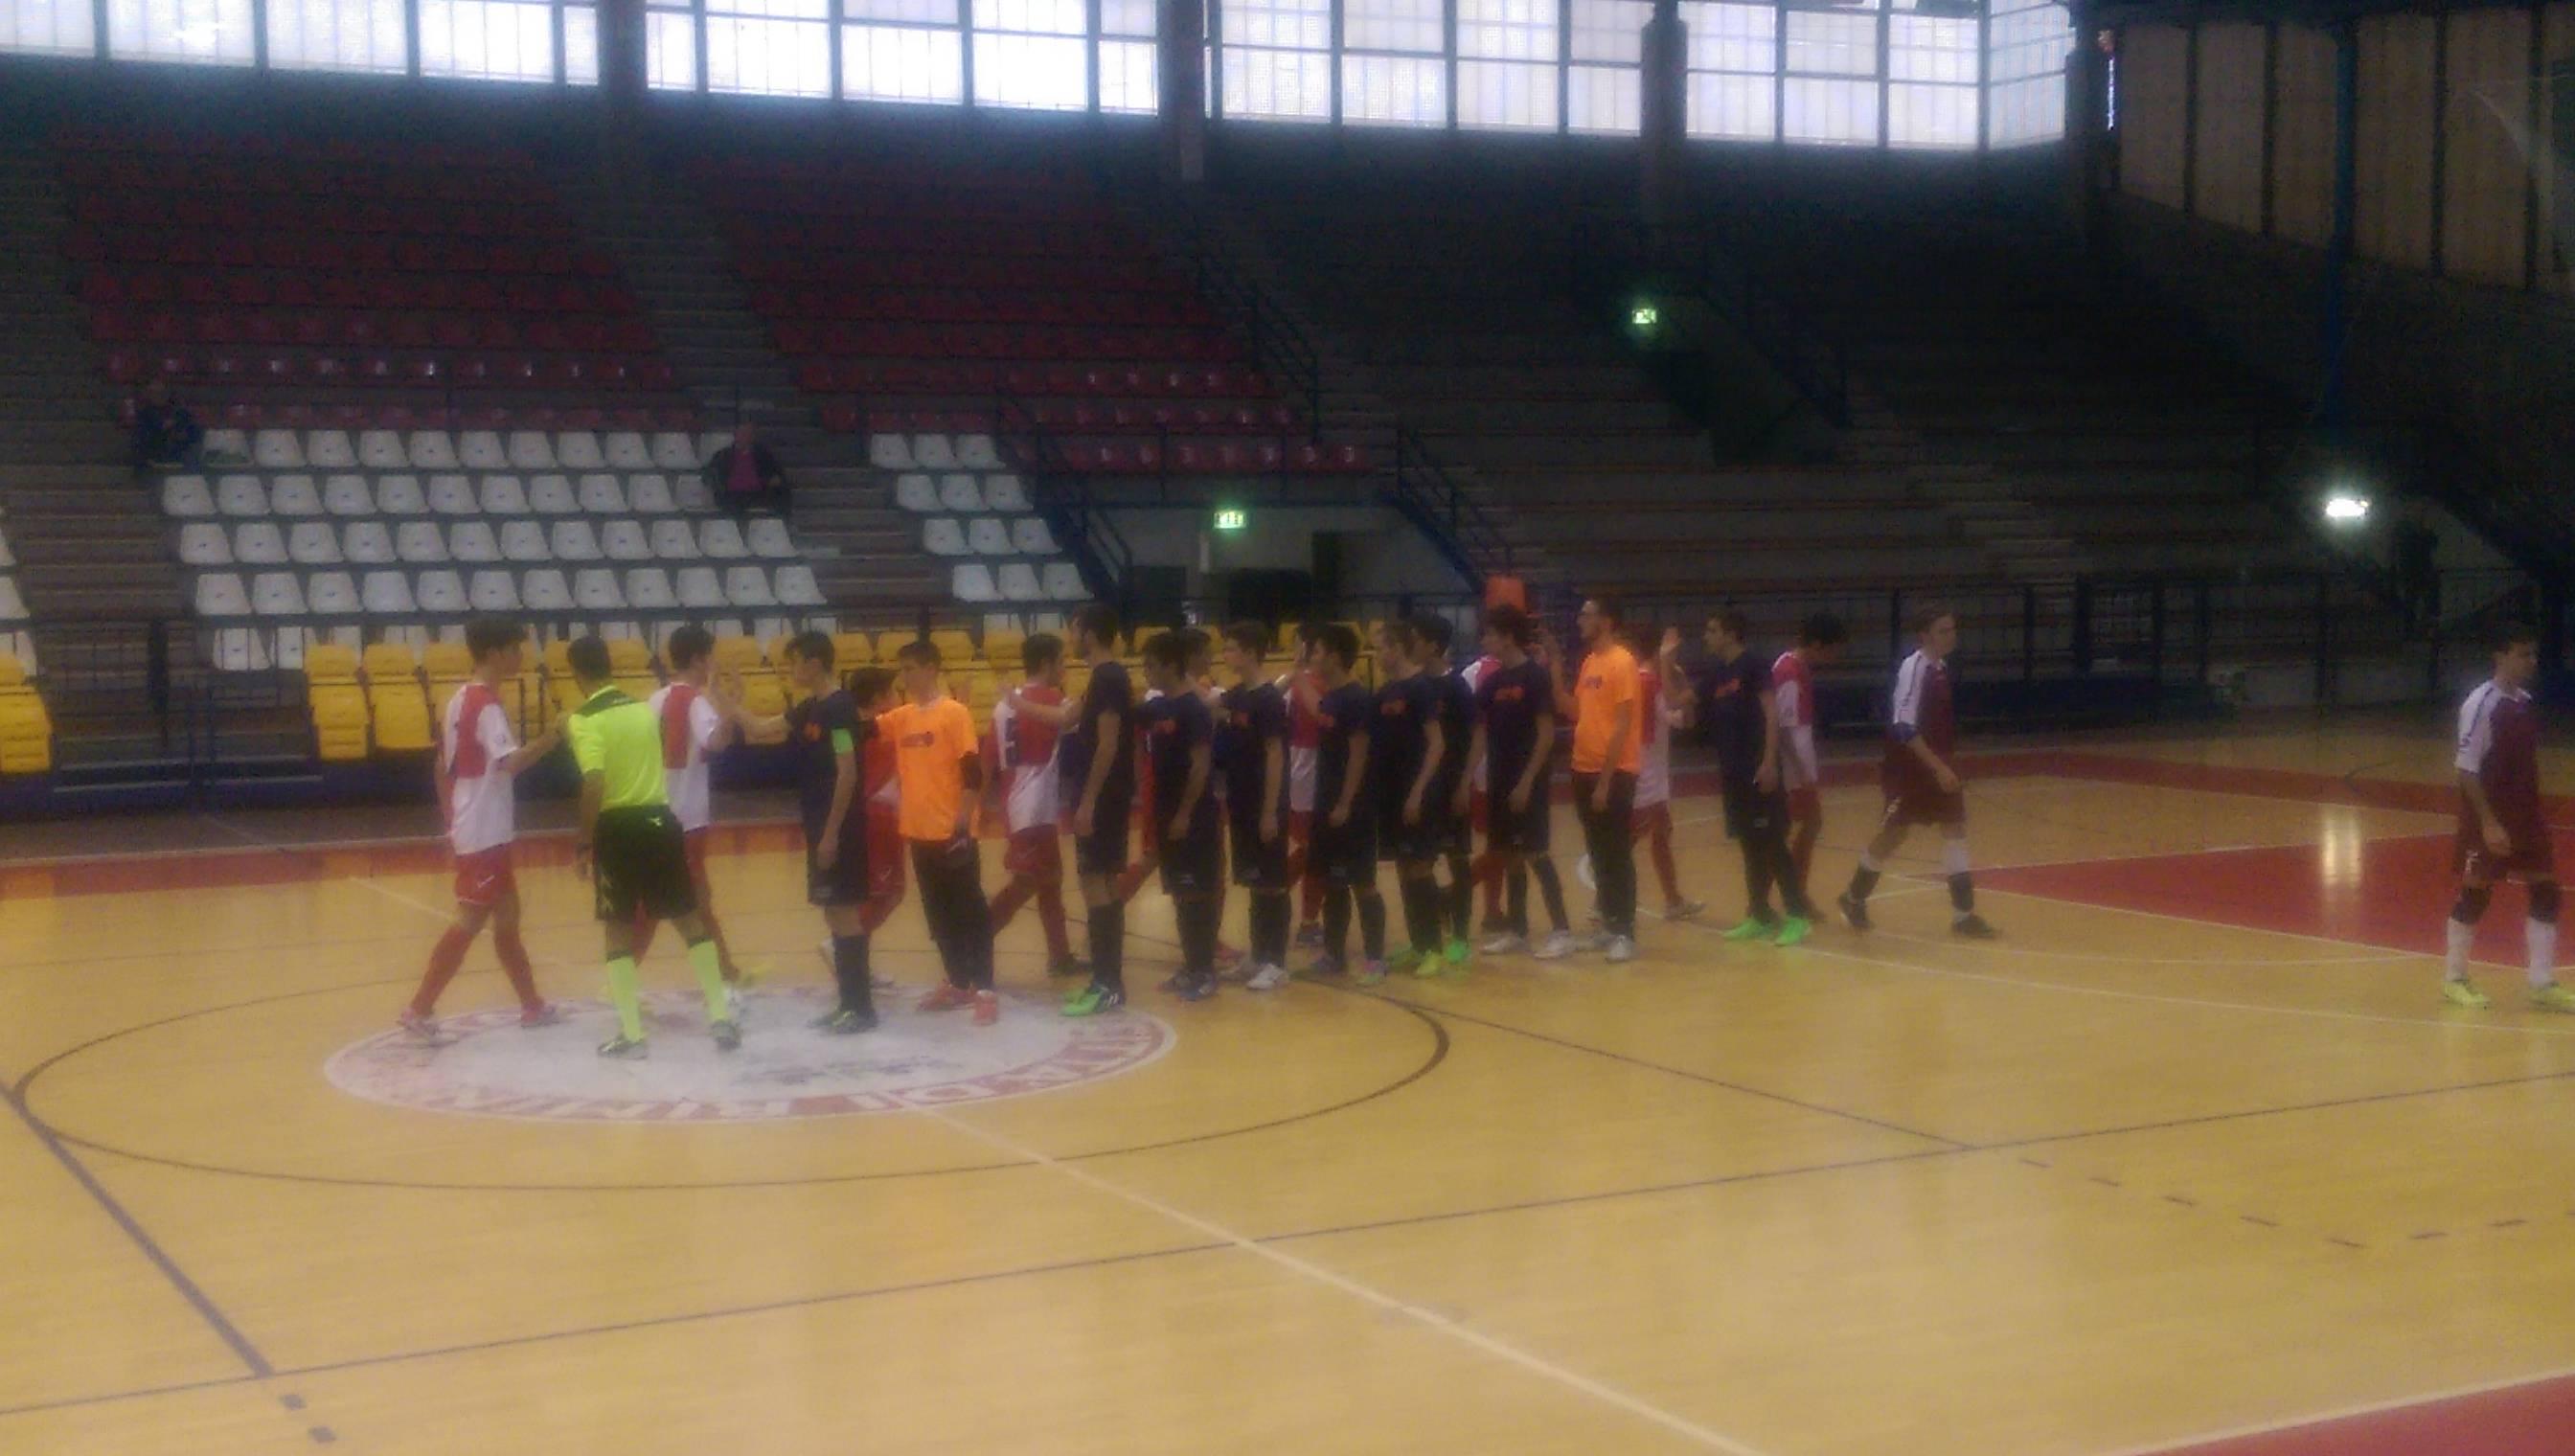 Rimini-Cesena 5-6